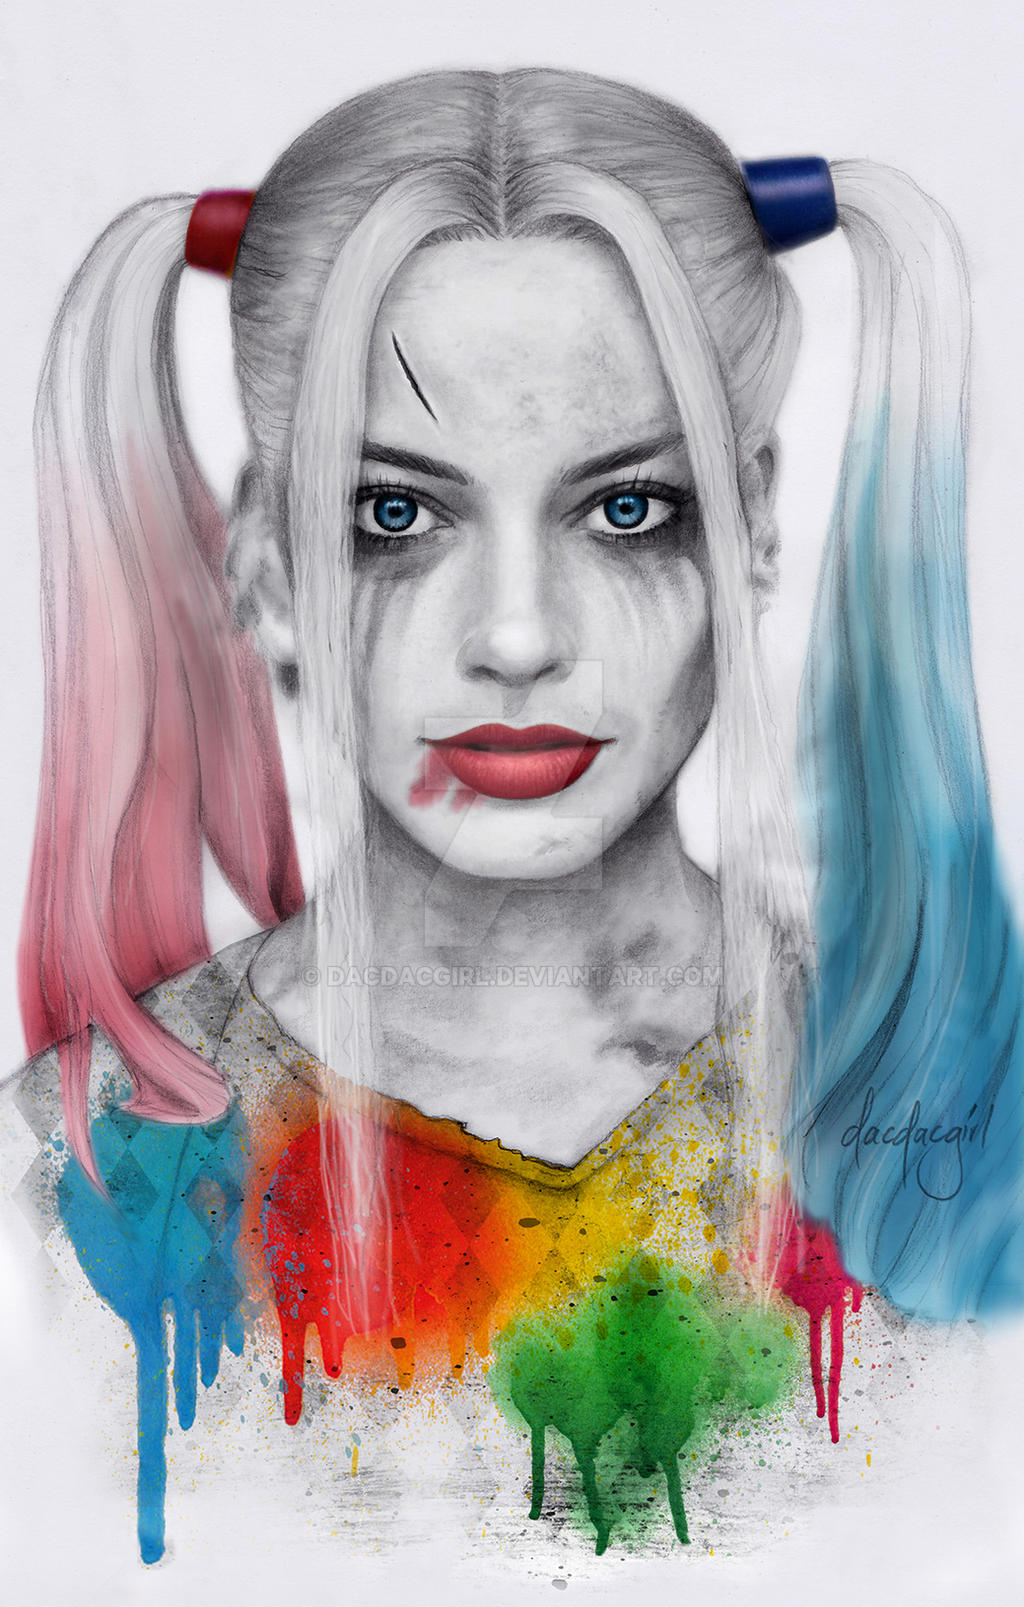 Harley Quinn Drawing: Harley Quinn Pencil Portrait By Dacdacgirl On DeviantArt